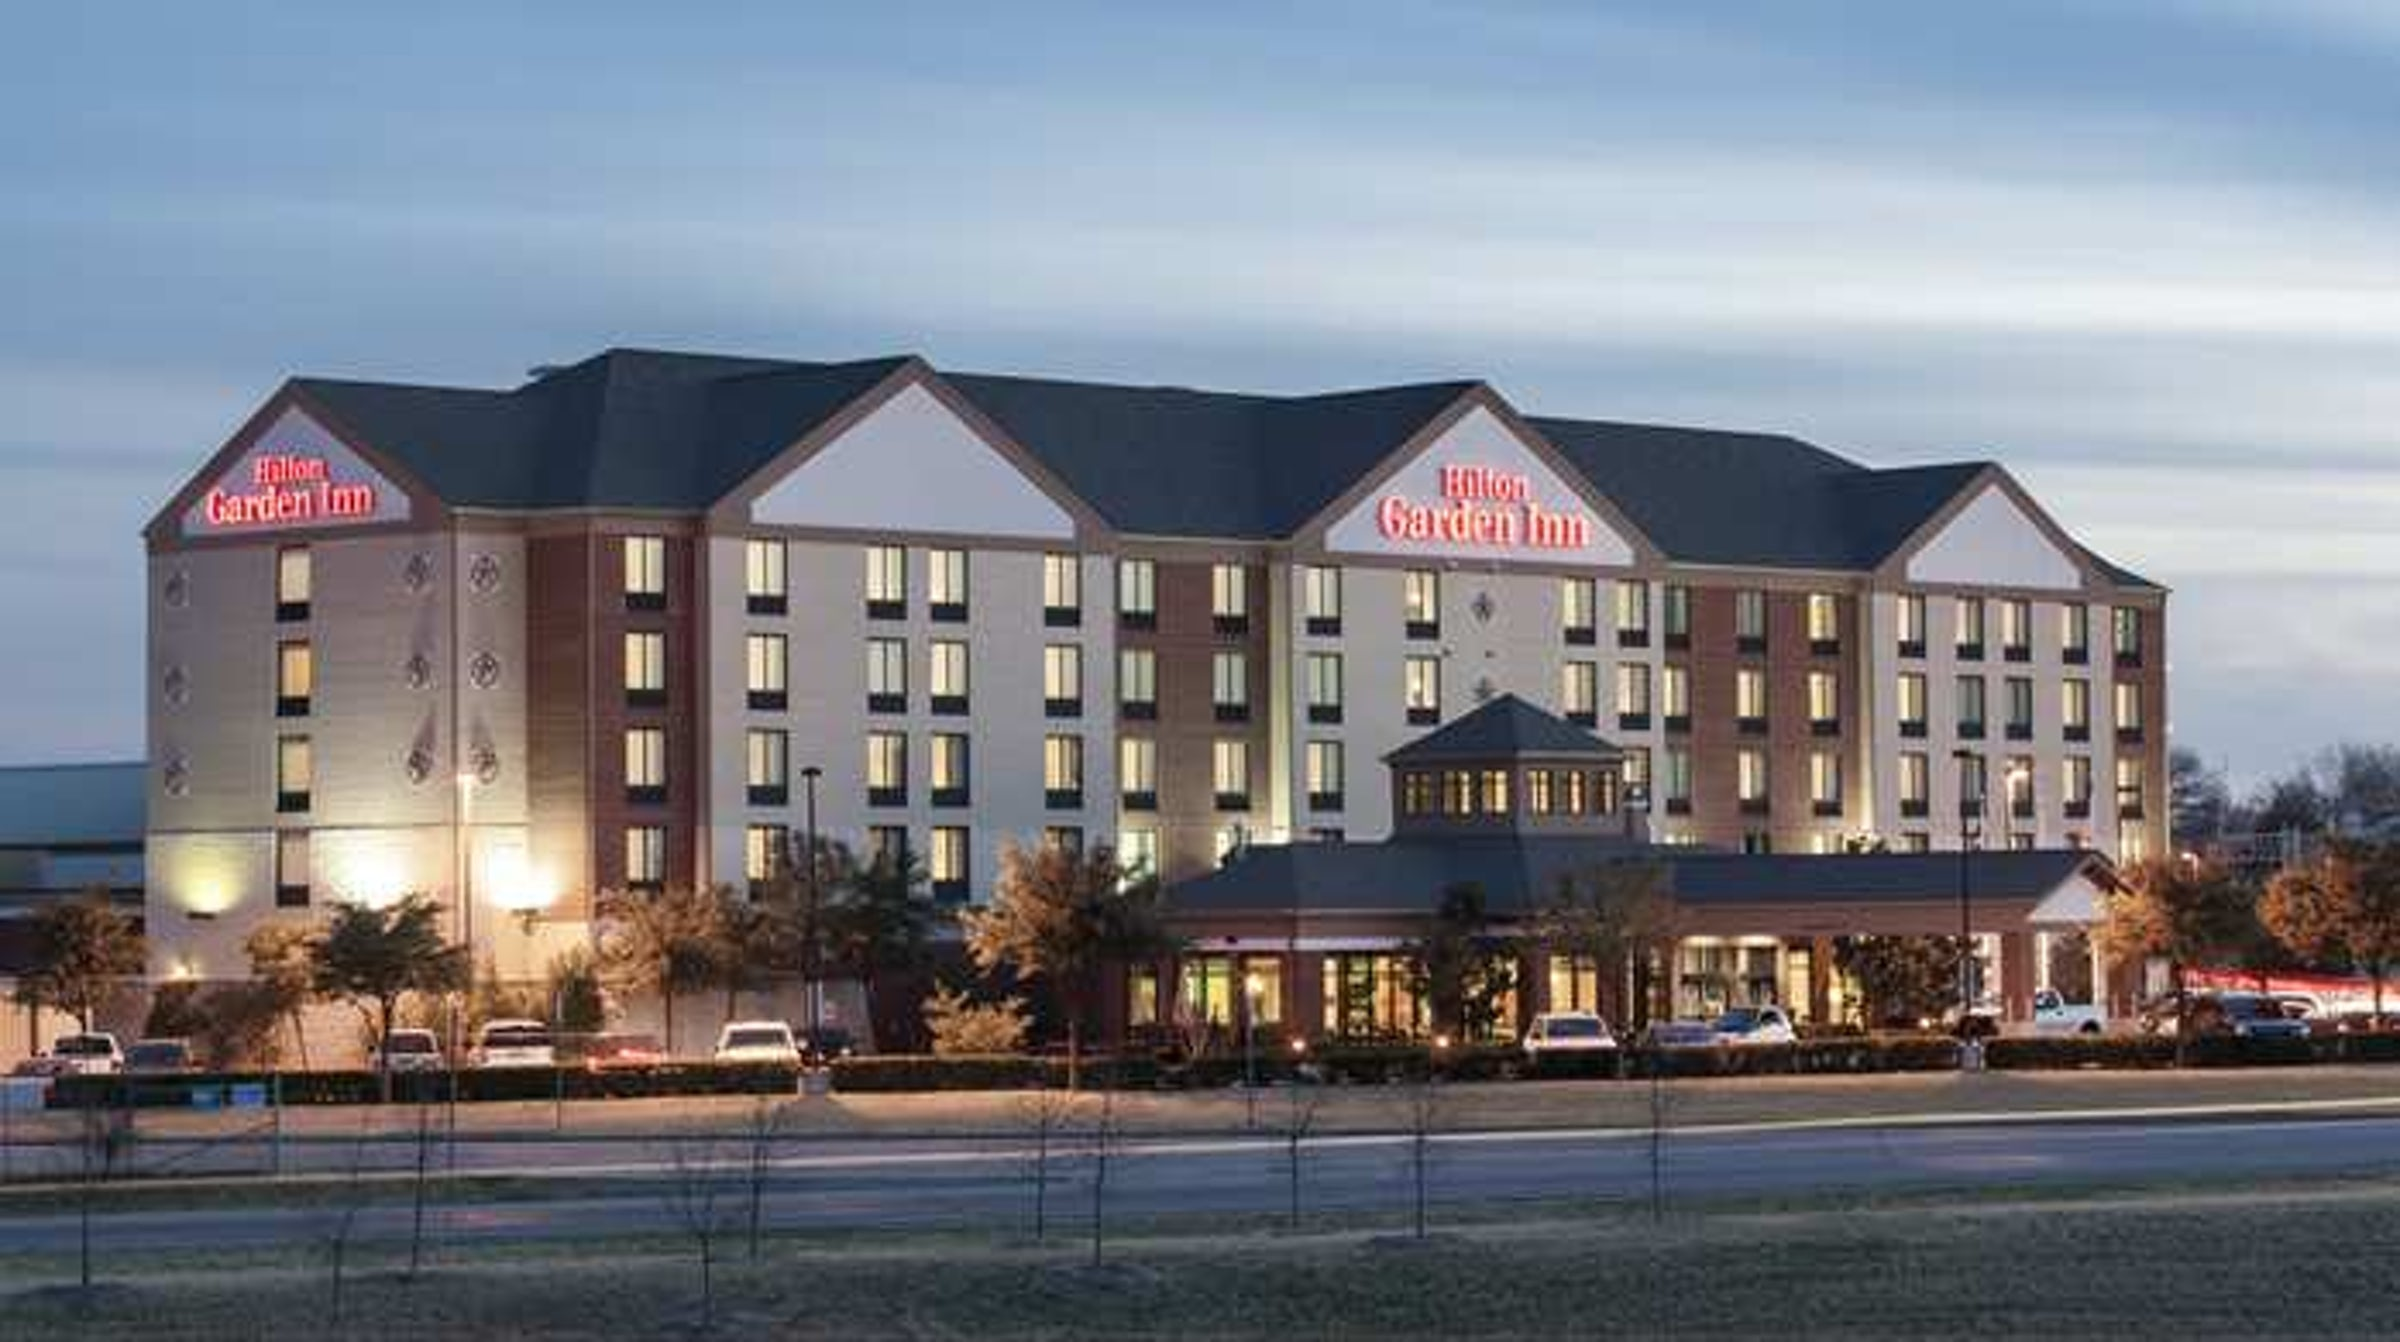 Hilton Garden Inn Dallas/Duncanville in Beyond Dallas